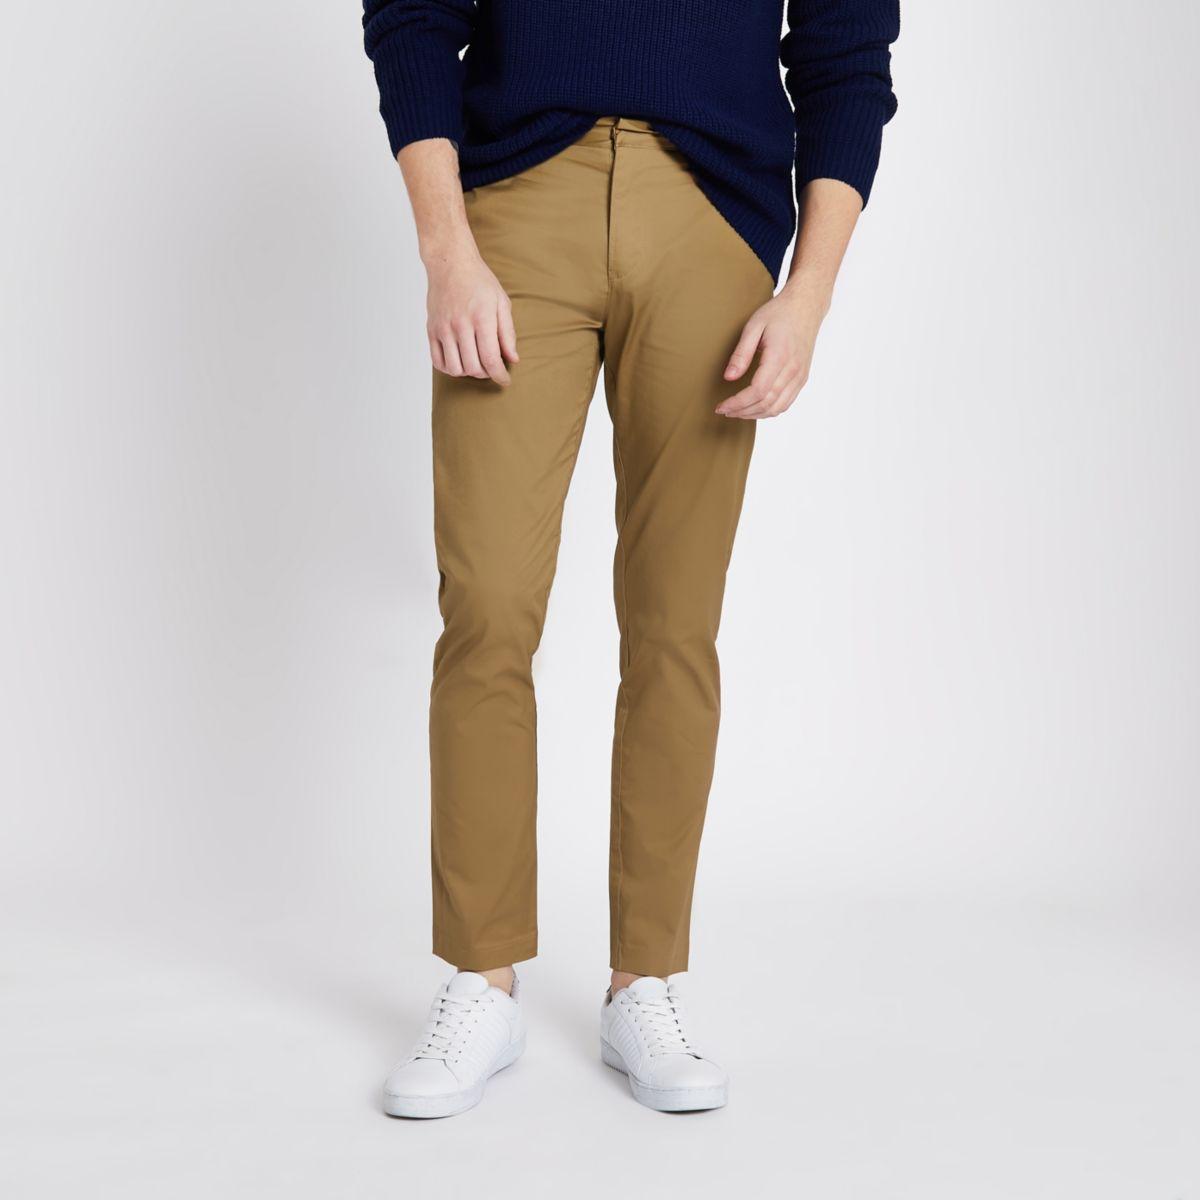 Tan skinny chino pants